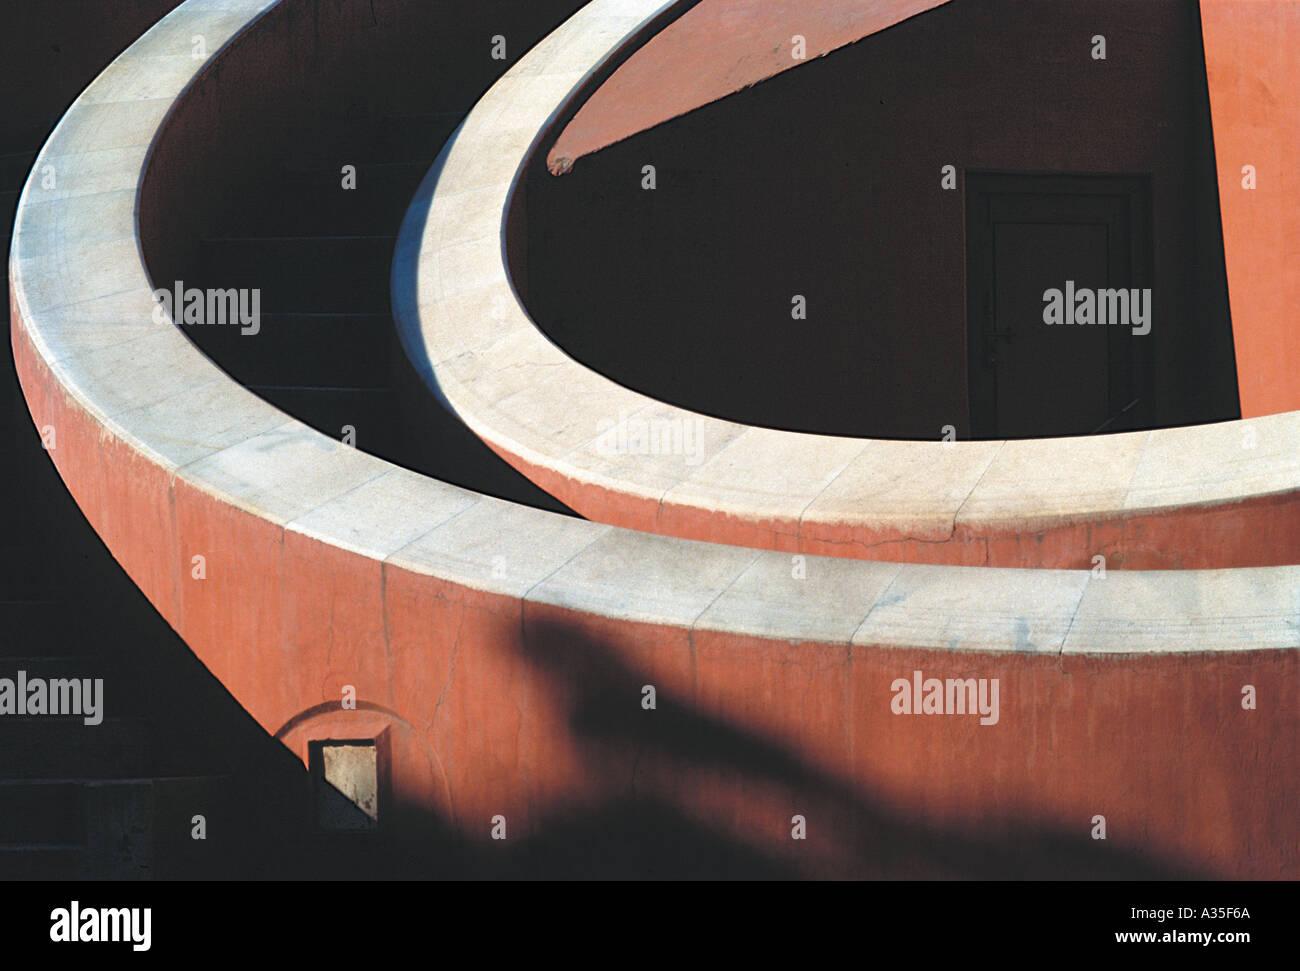 AMA JM09 Jantar Mantar osservatorio astronomico Delhi India Immagini Stock